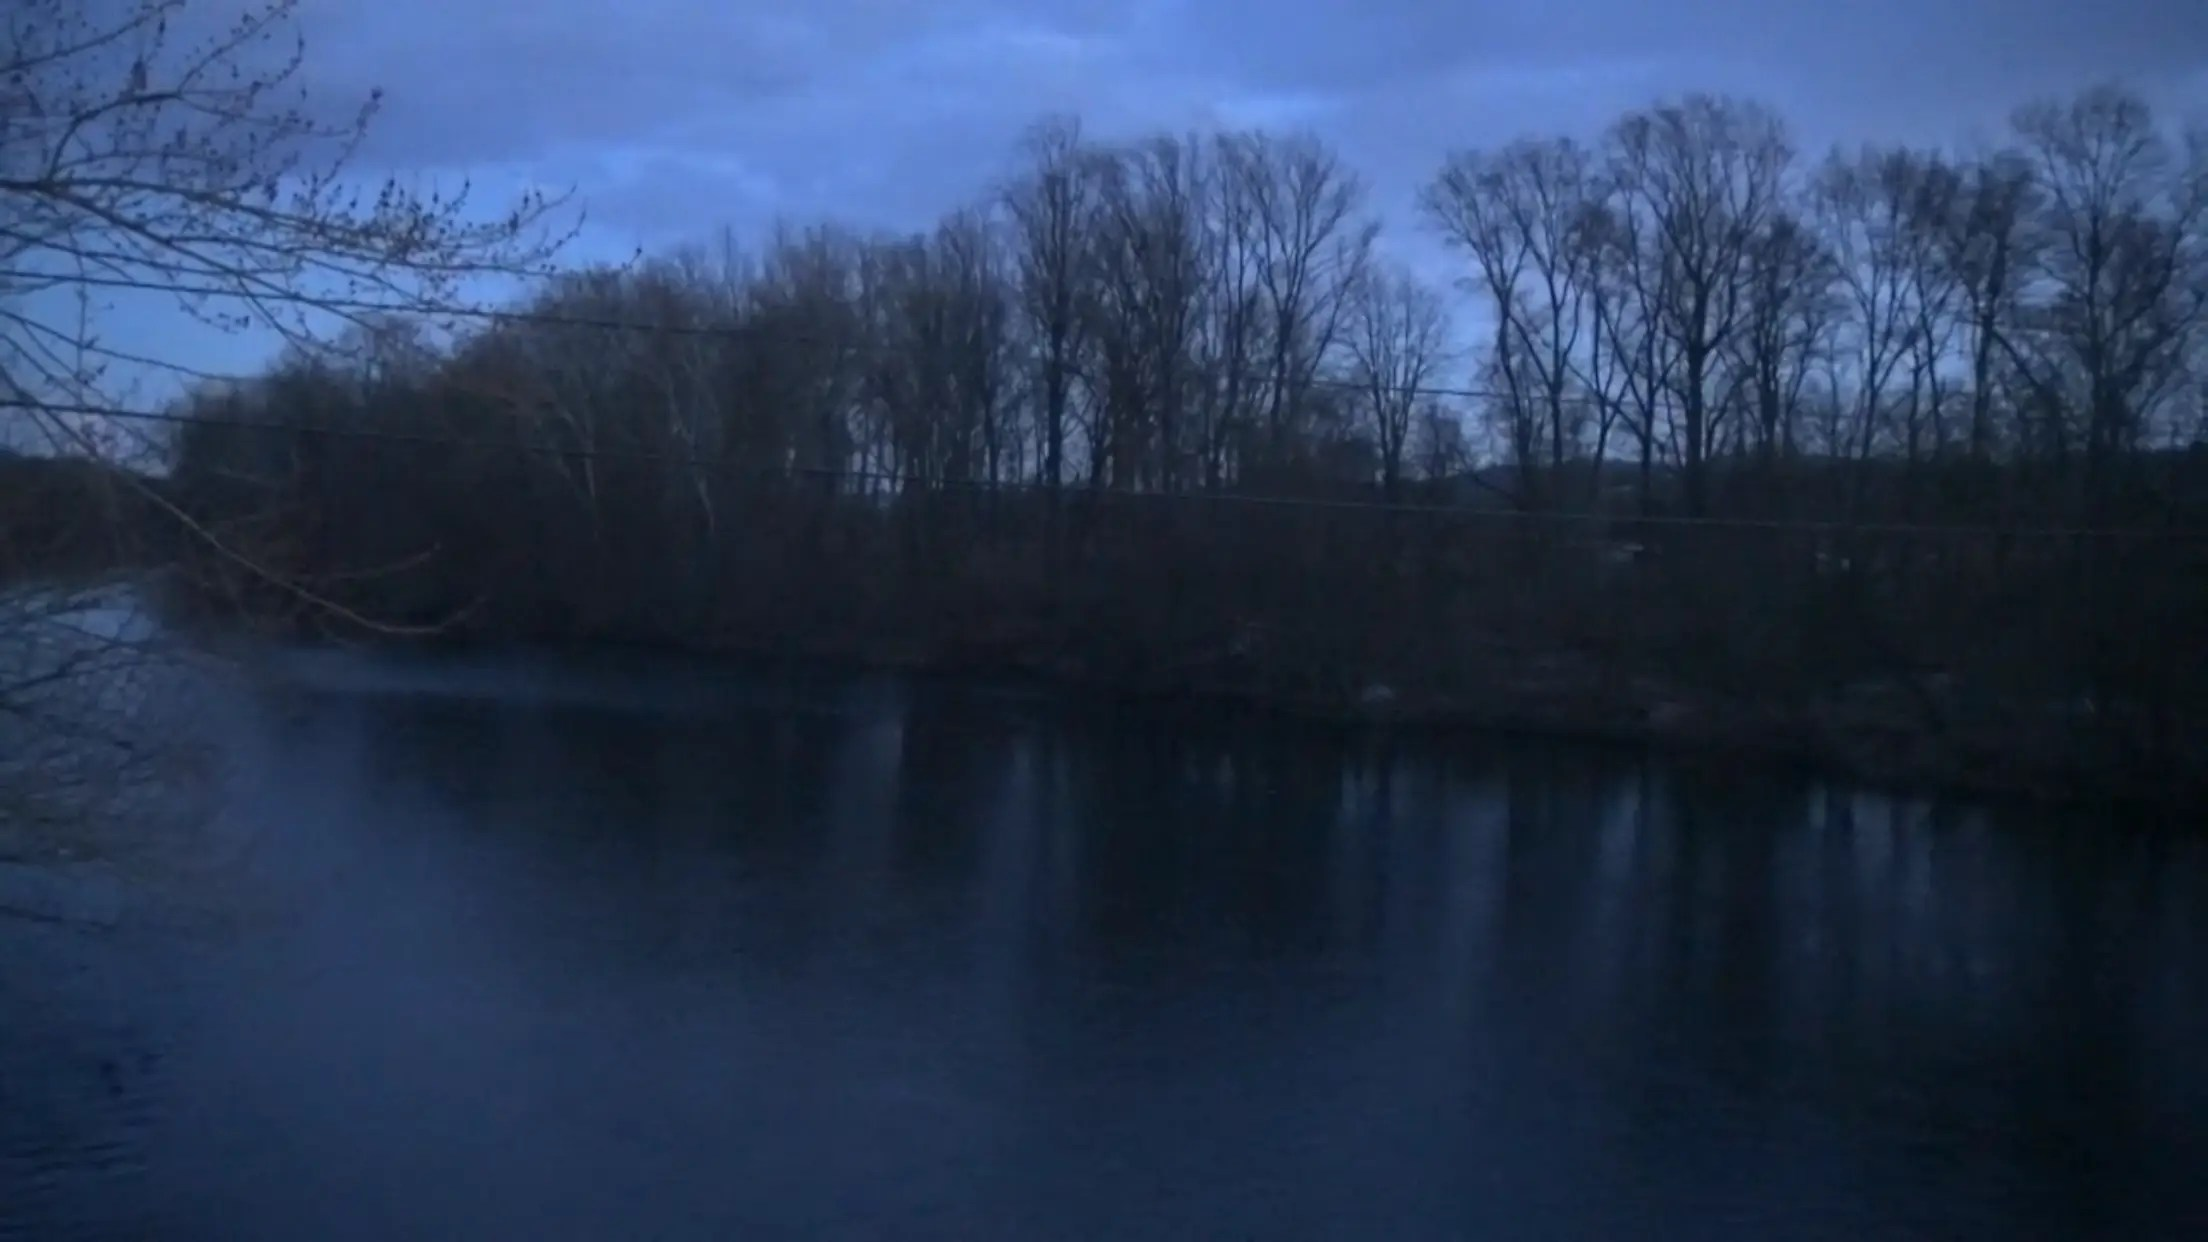 Body found in Schuylkill River in Berks County